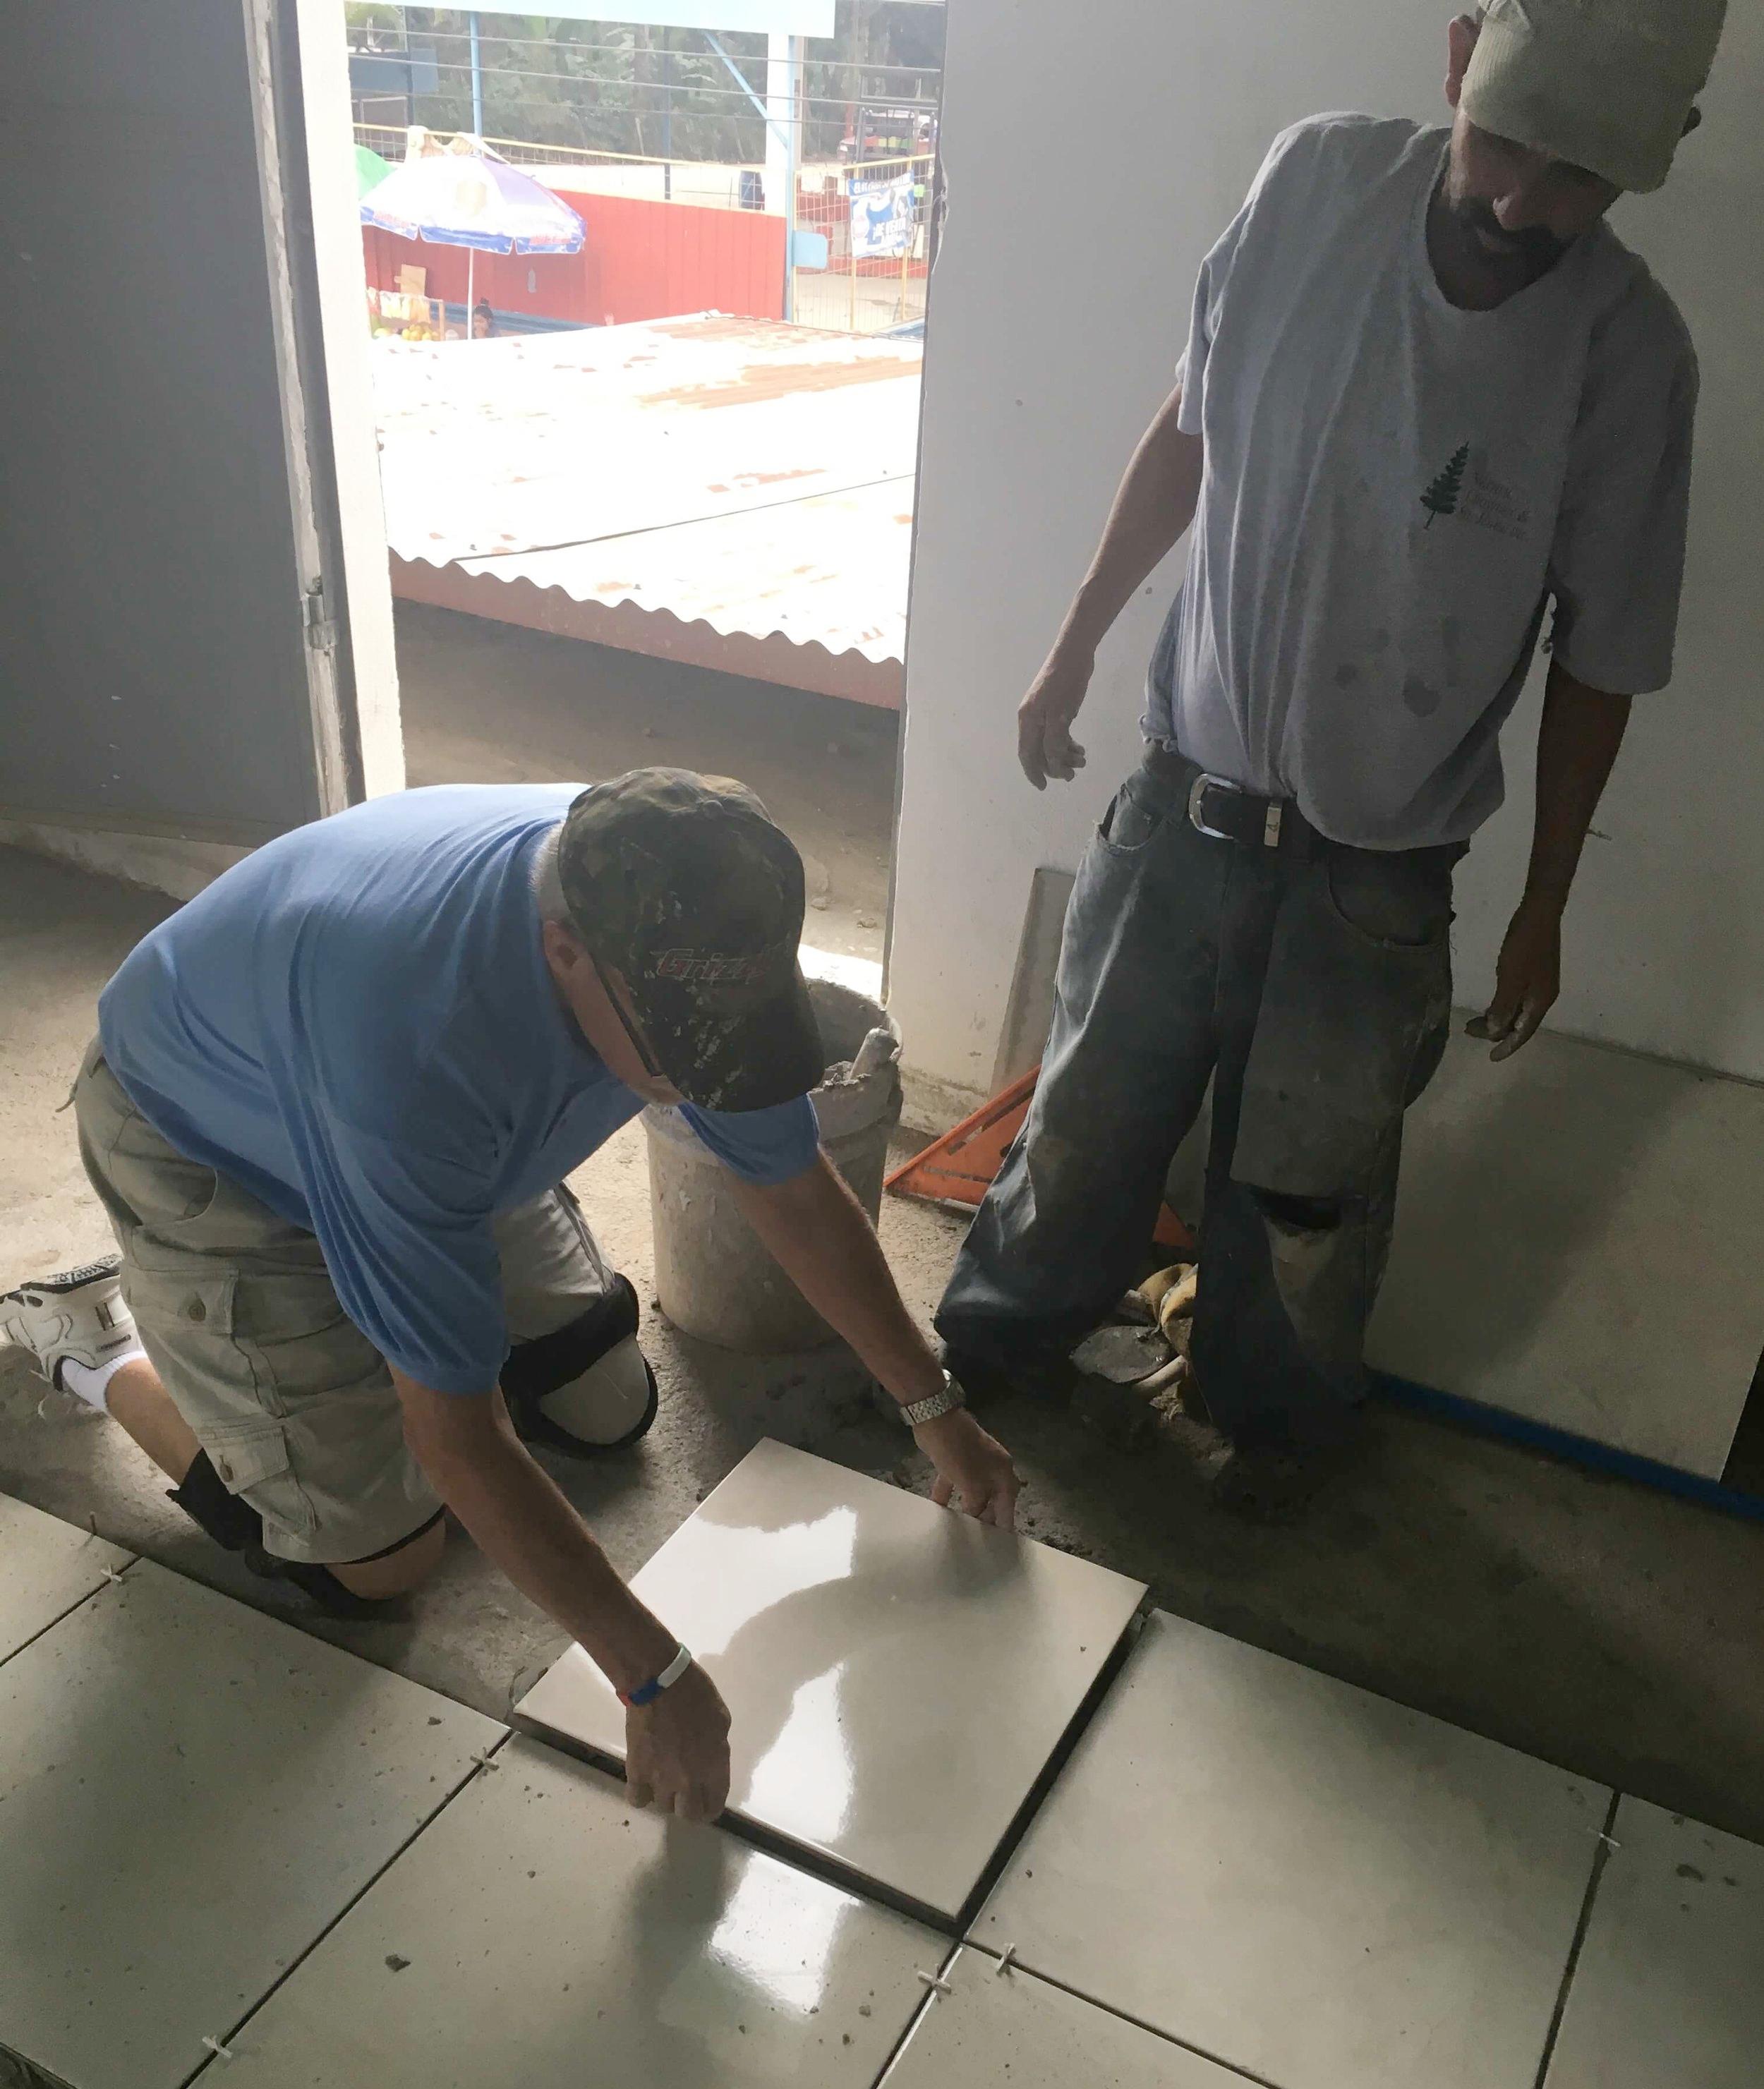 Dean Kucharski lays tile while a Guatemalan team member looks on.